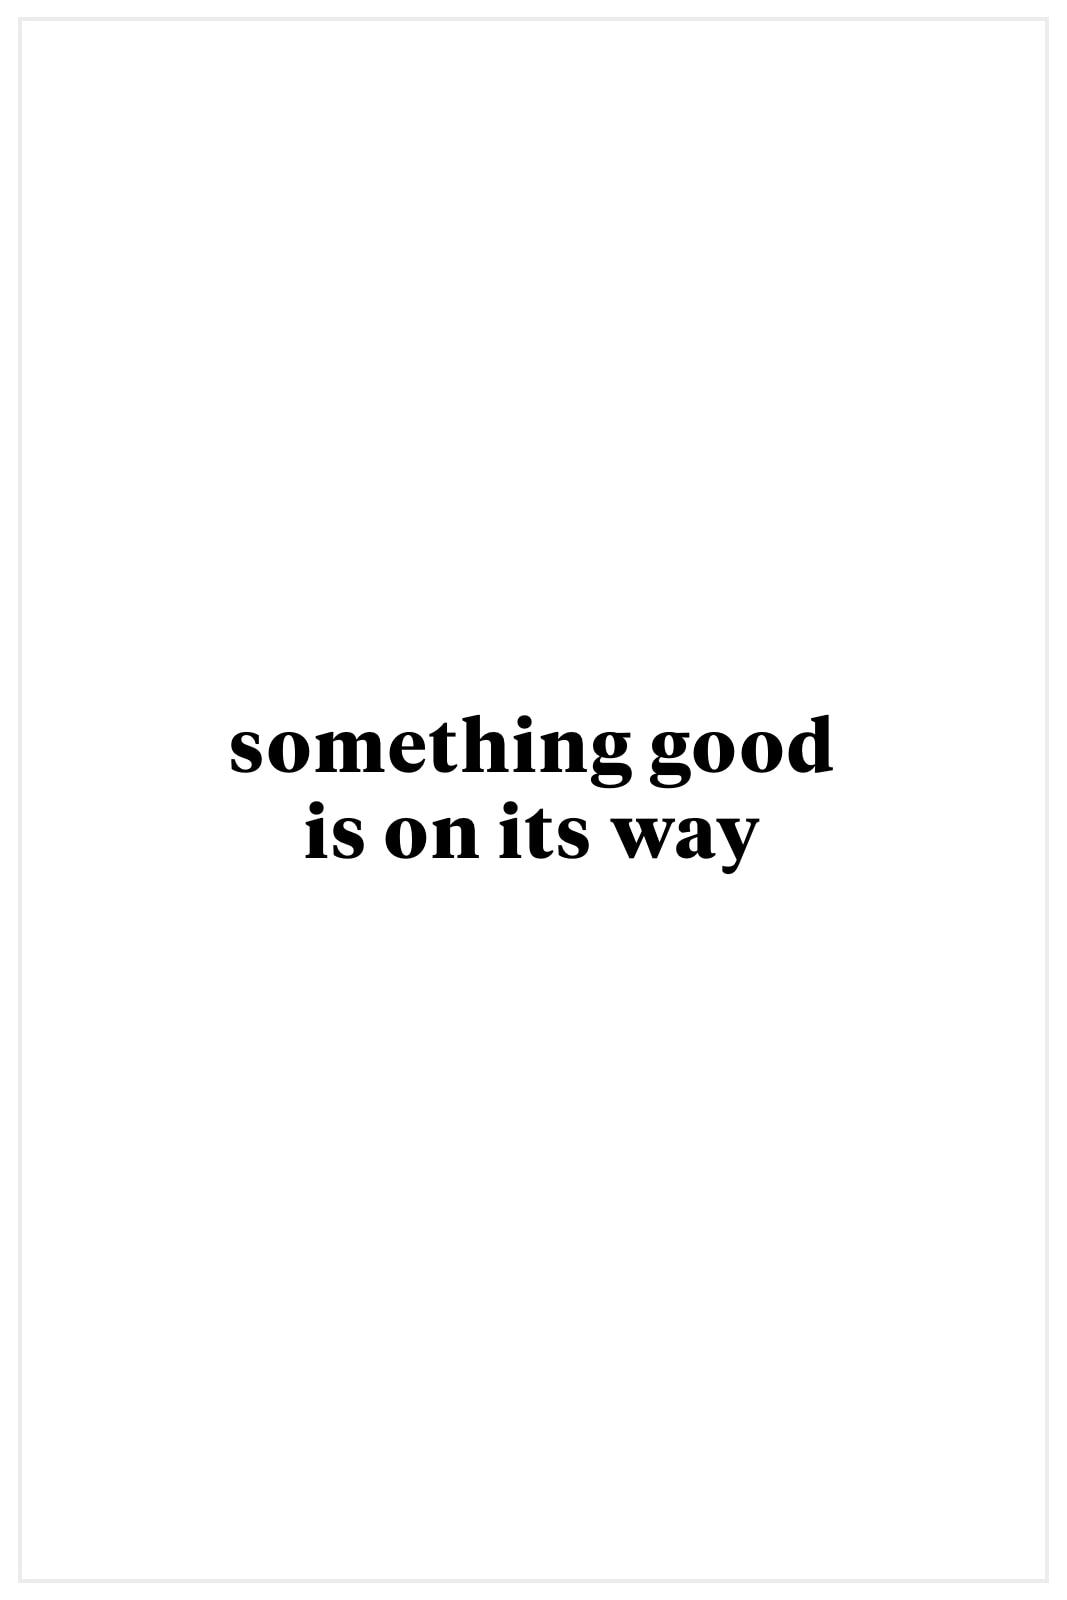 new styles 835a9 01488 696 Sneaker